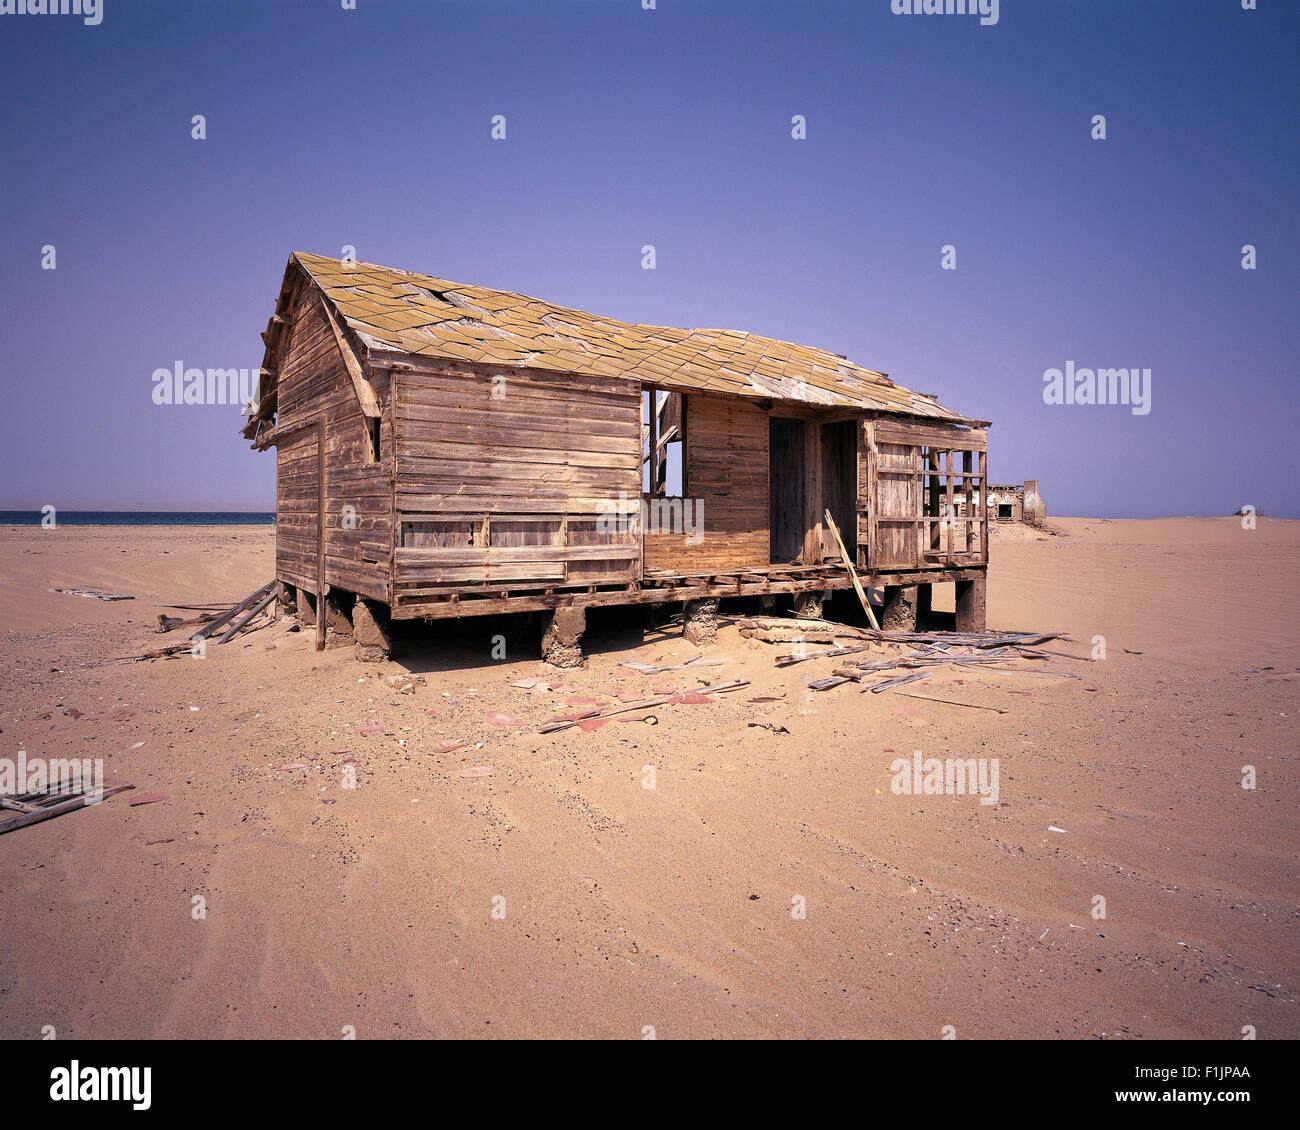 Deserted House Baya Del Tigre Angola, Africa - Stock Image